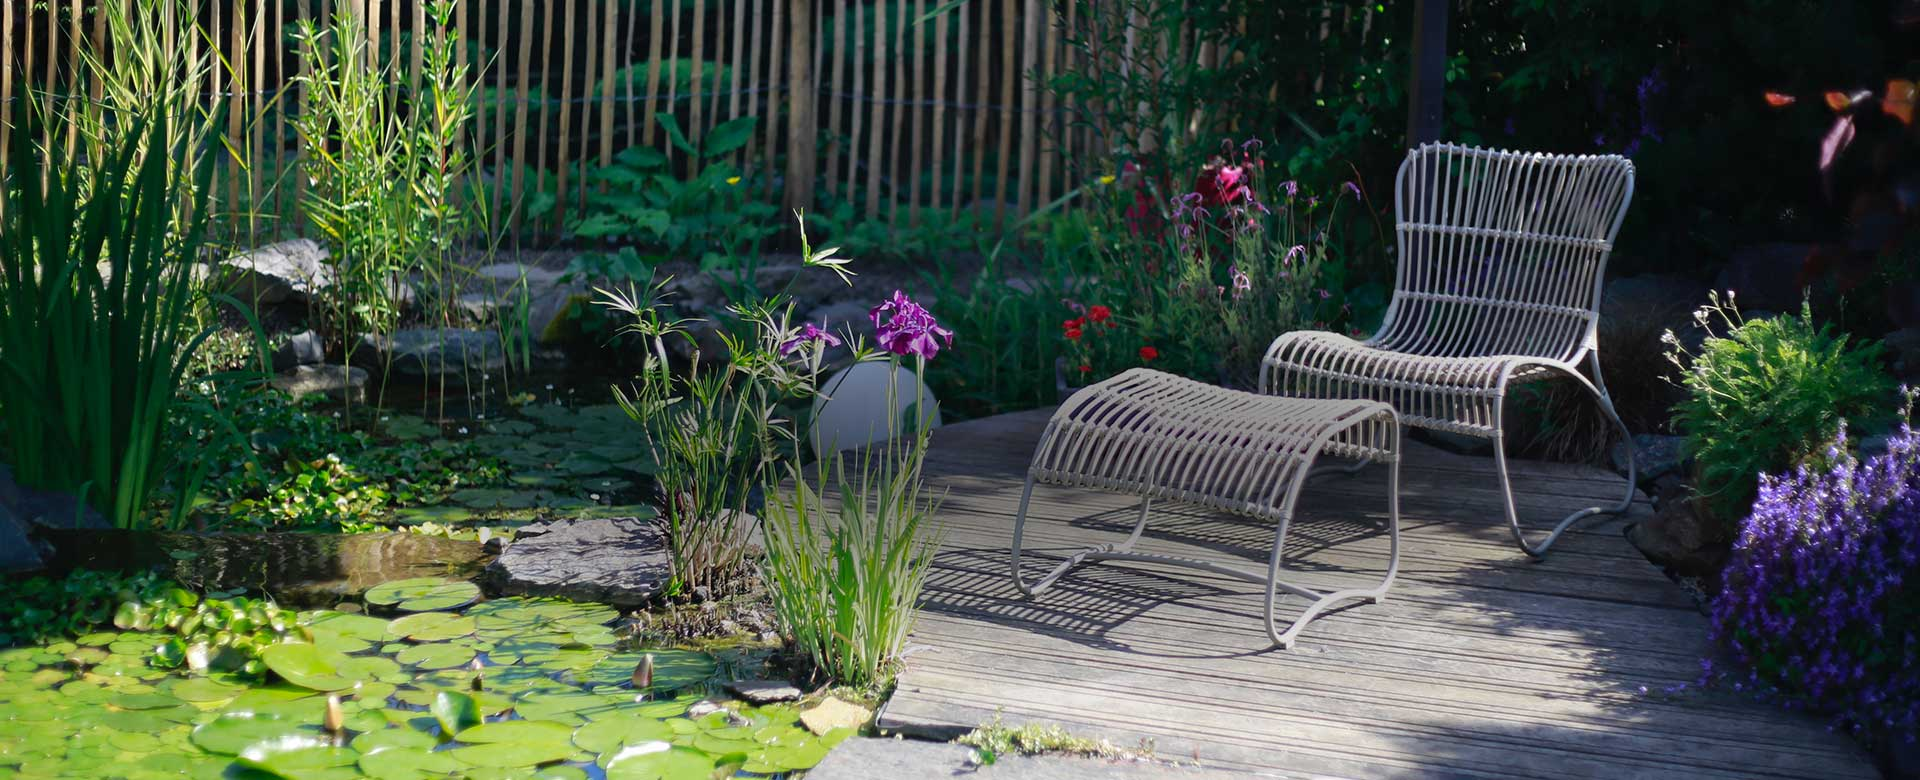 Accueil tom pousse paysage for Entretien jardin strasbourg